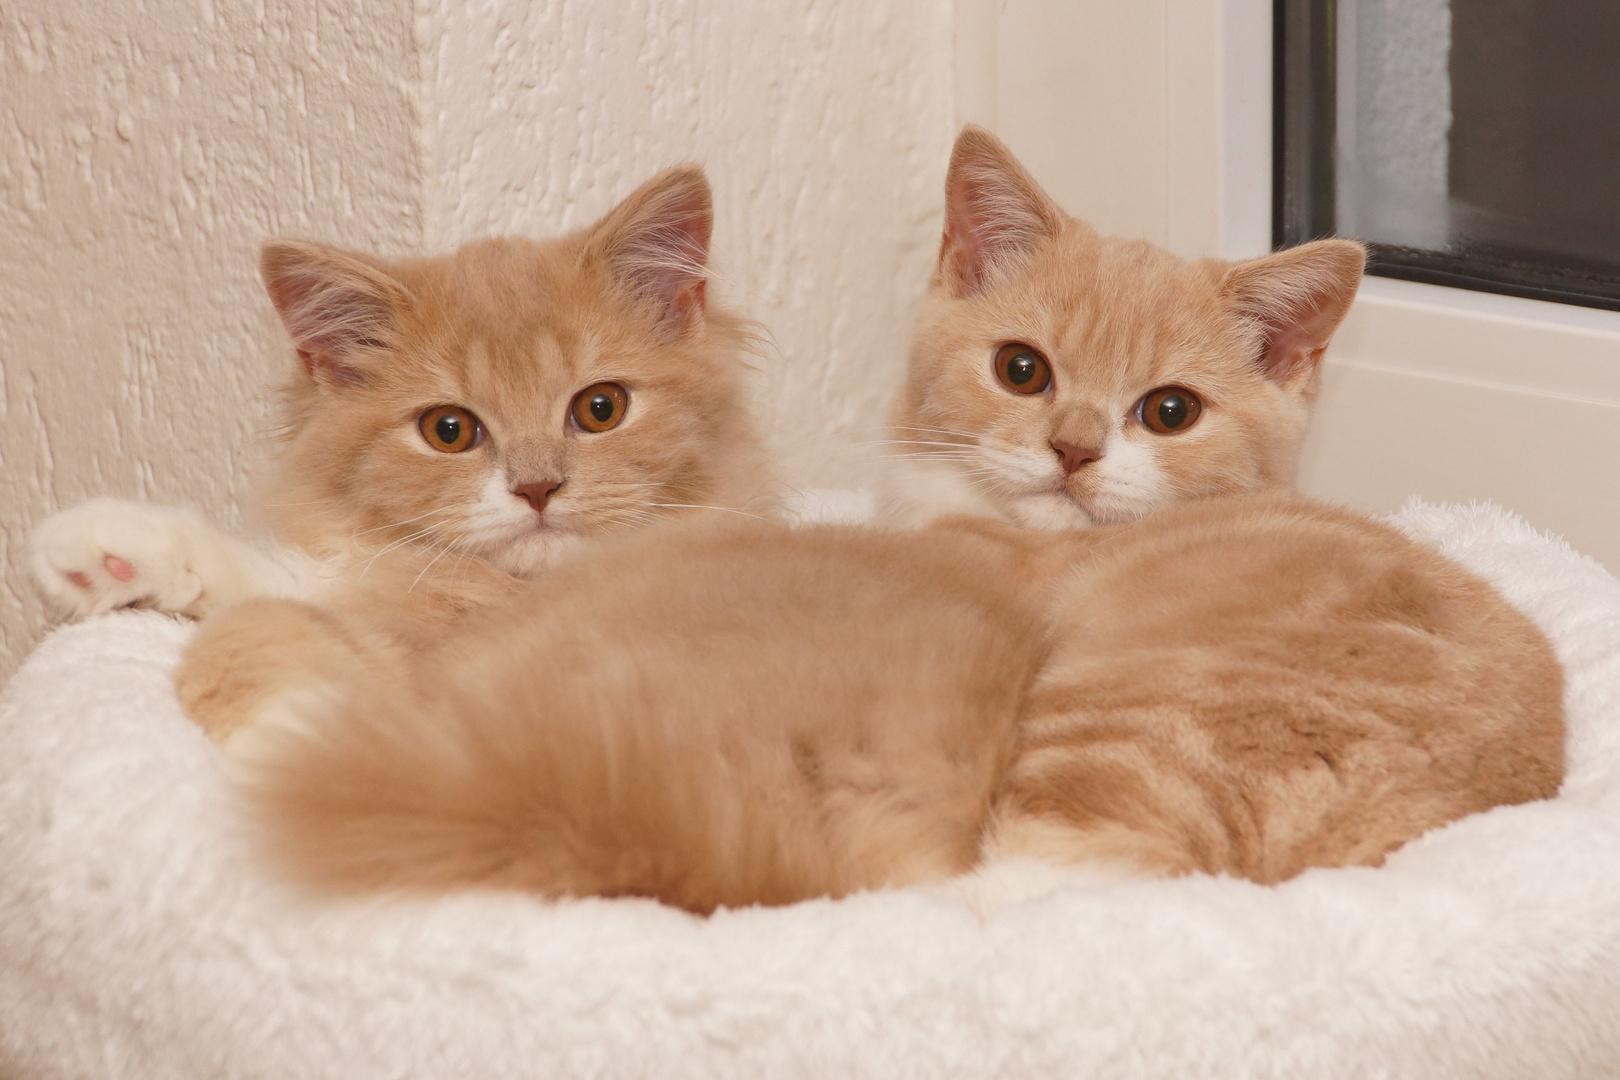 Kitten from Gloryhill